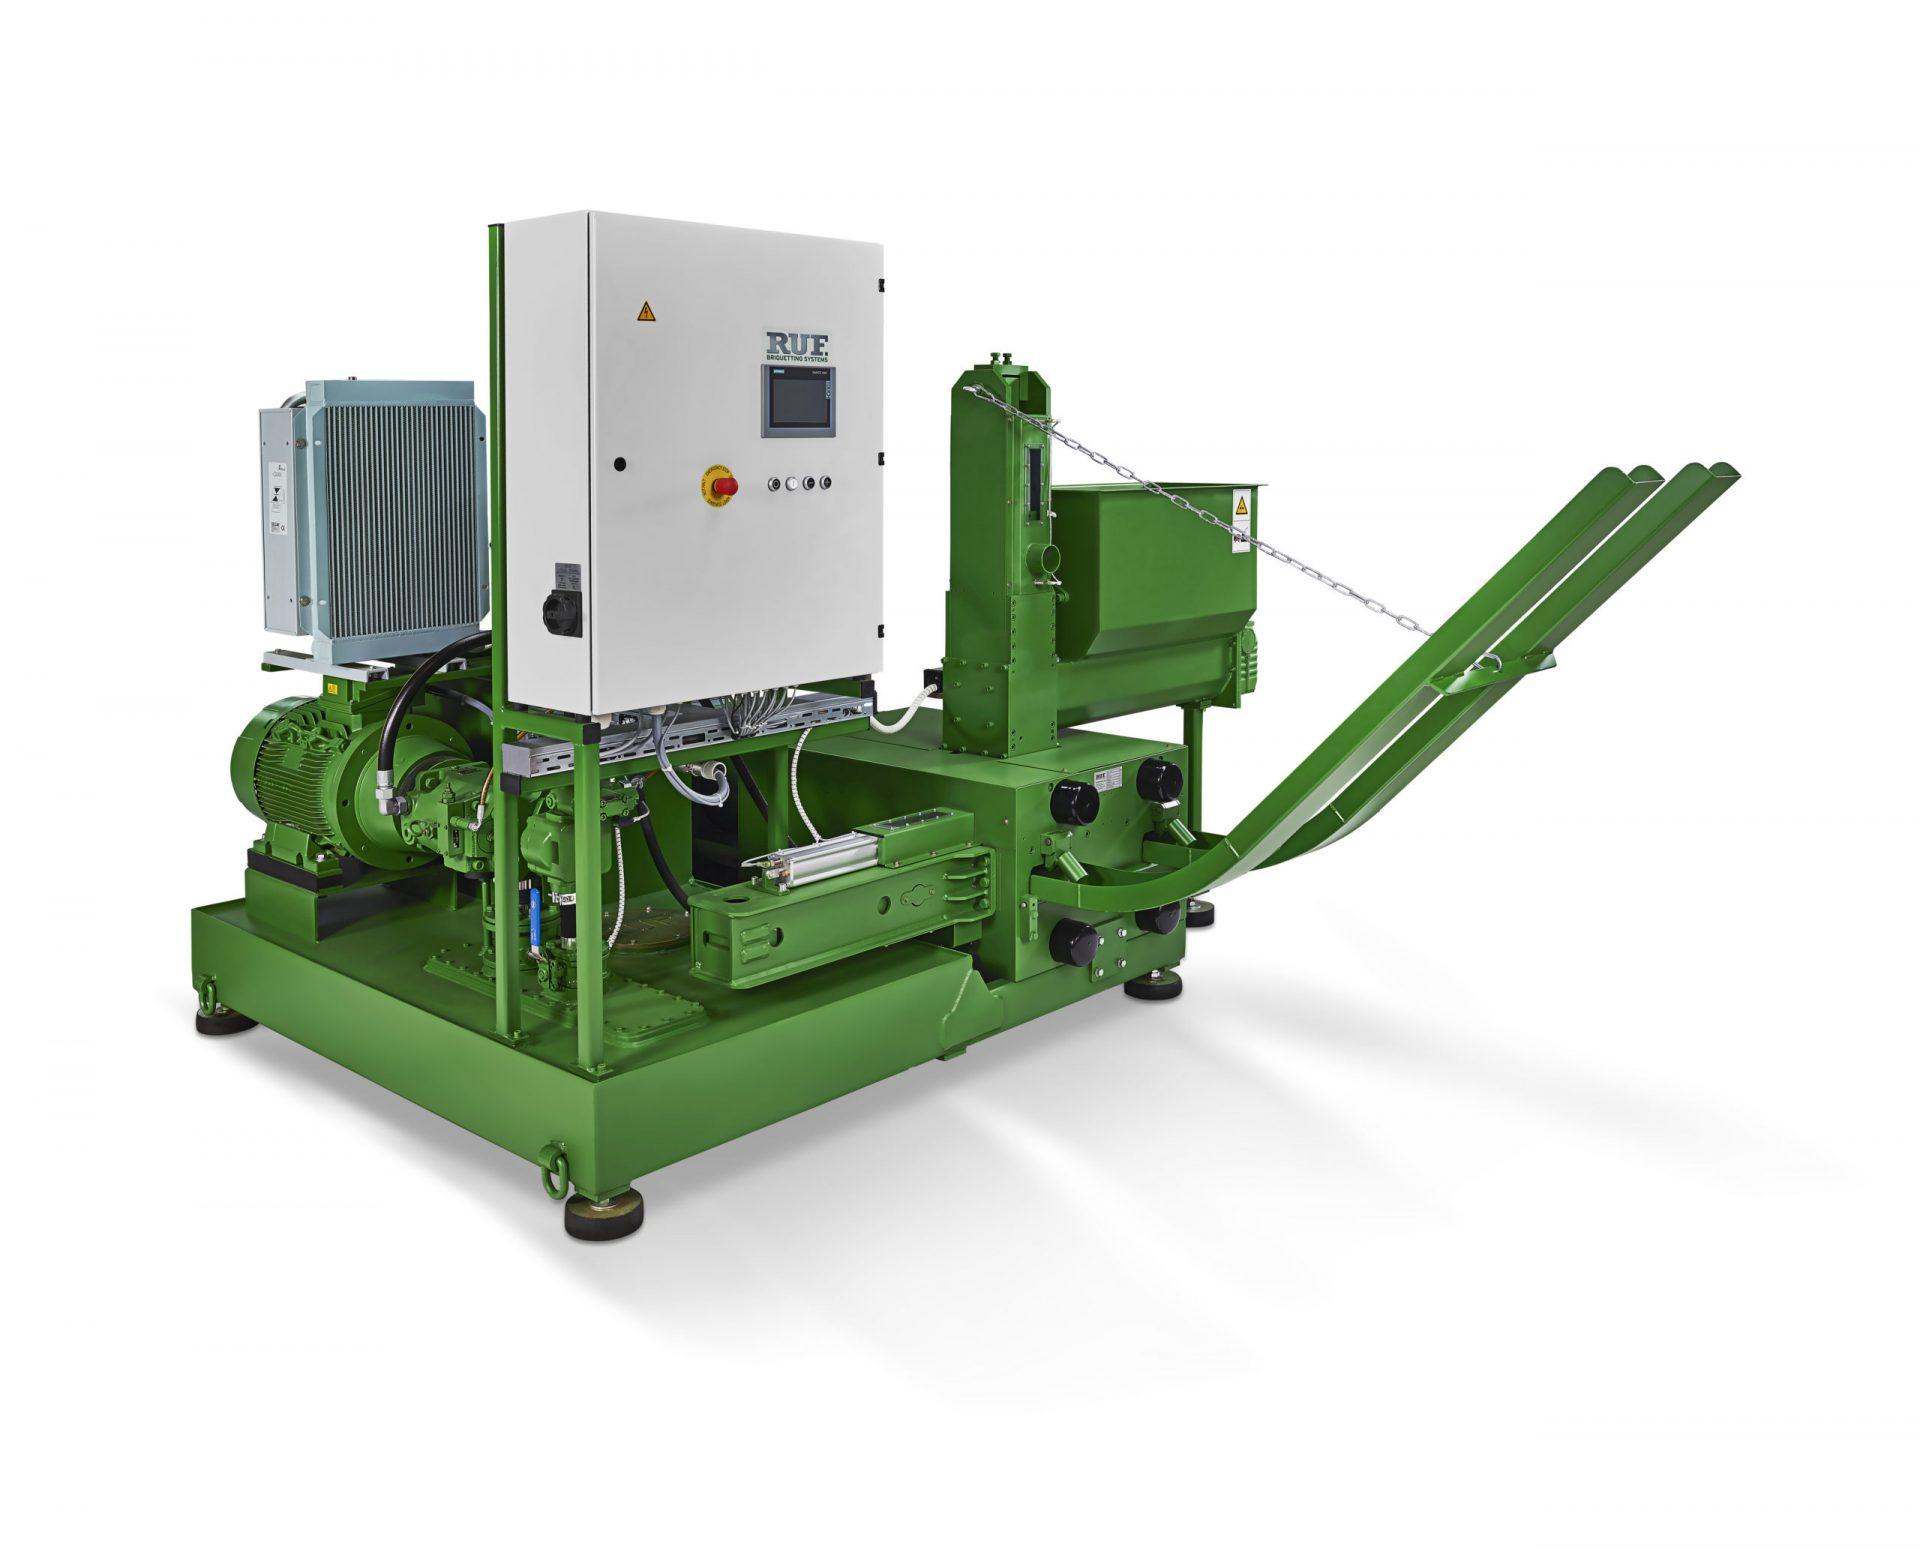 RUF Lignum R4 machine